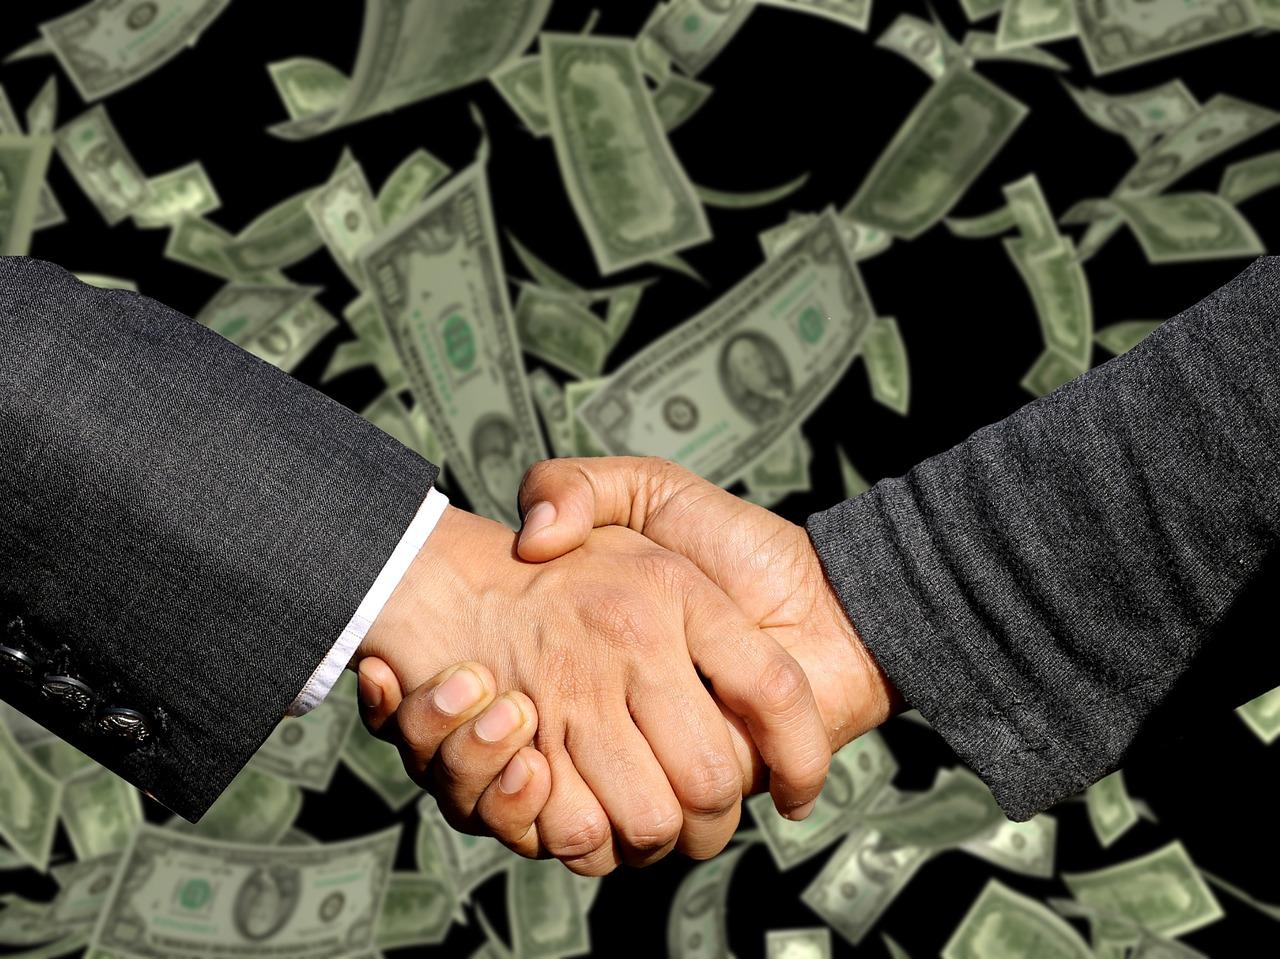 Livefreedebt.com Introduces Debt Settlement Solution To America